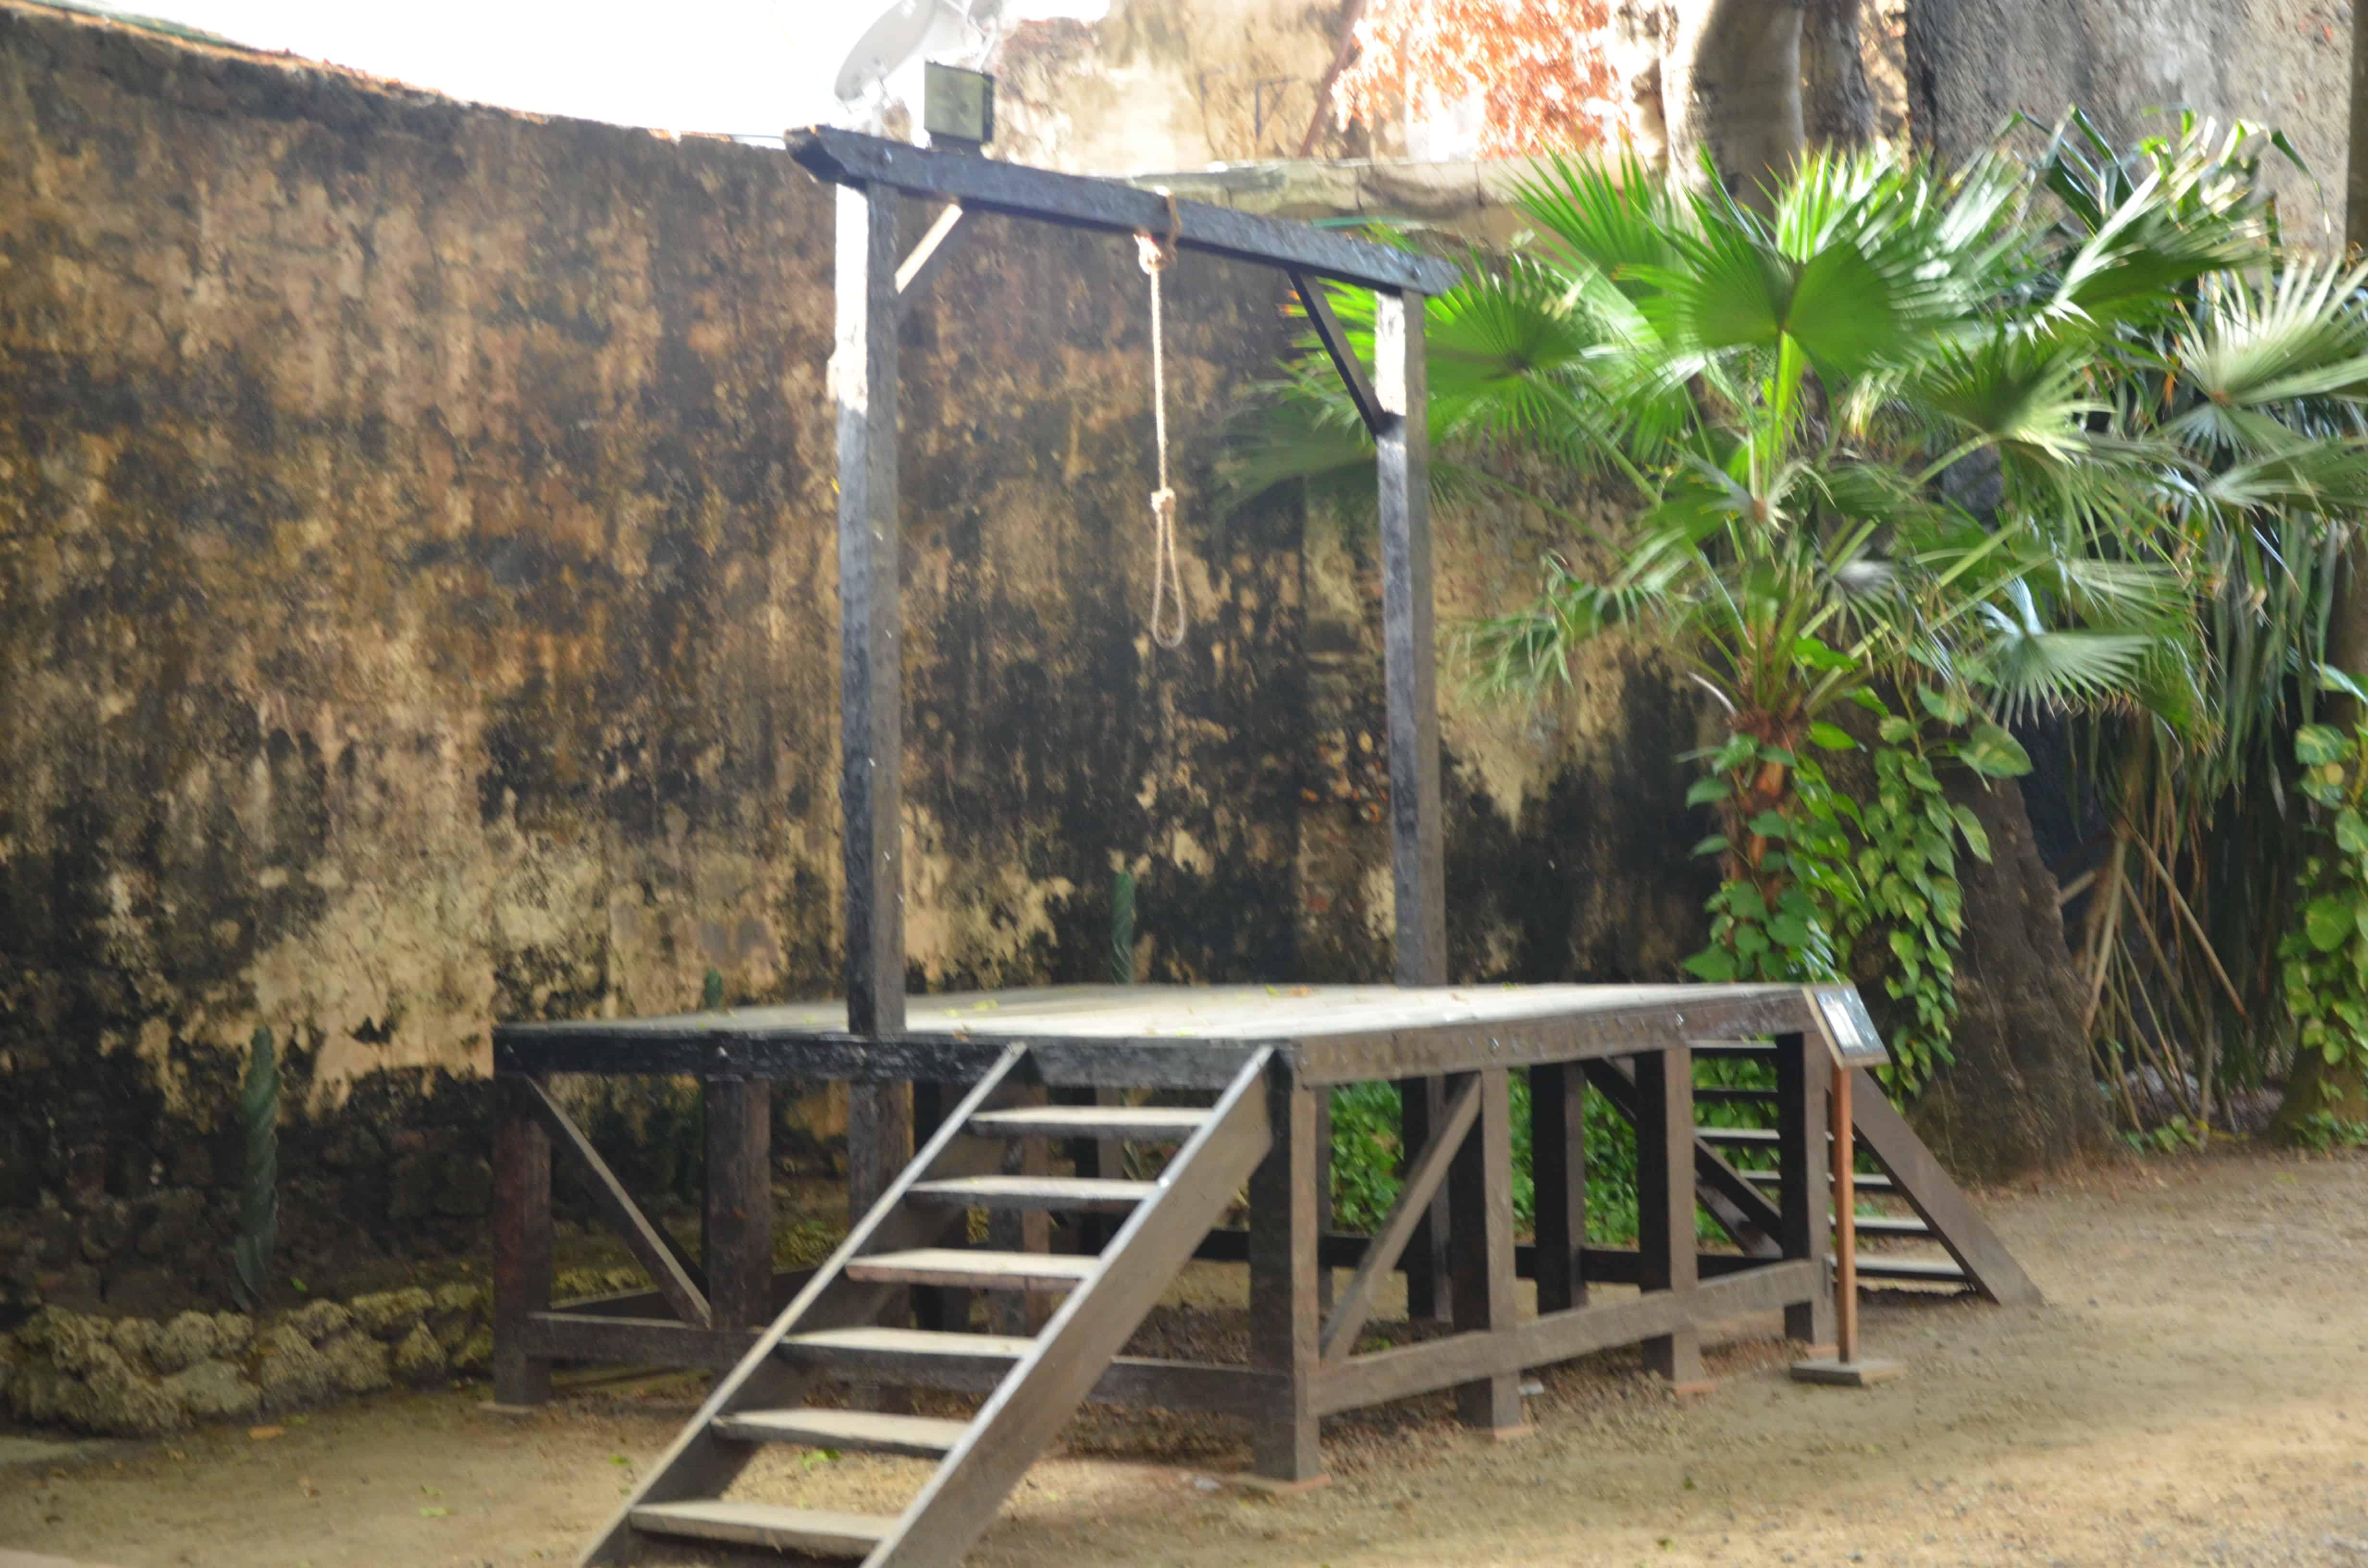 Fendaux Travelblog for architecture Cartagena